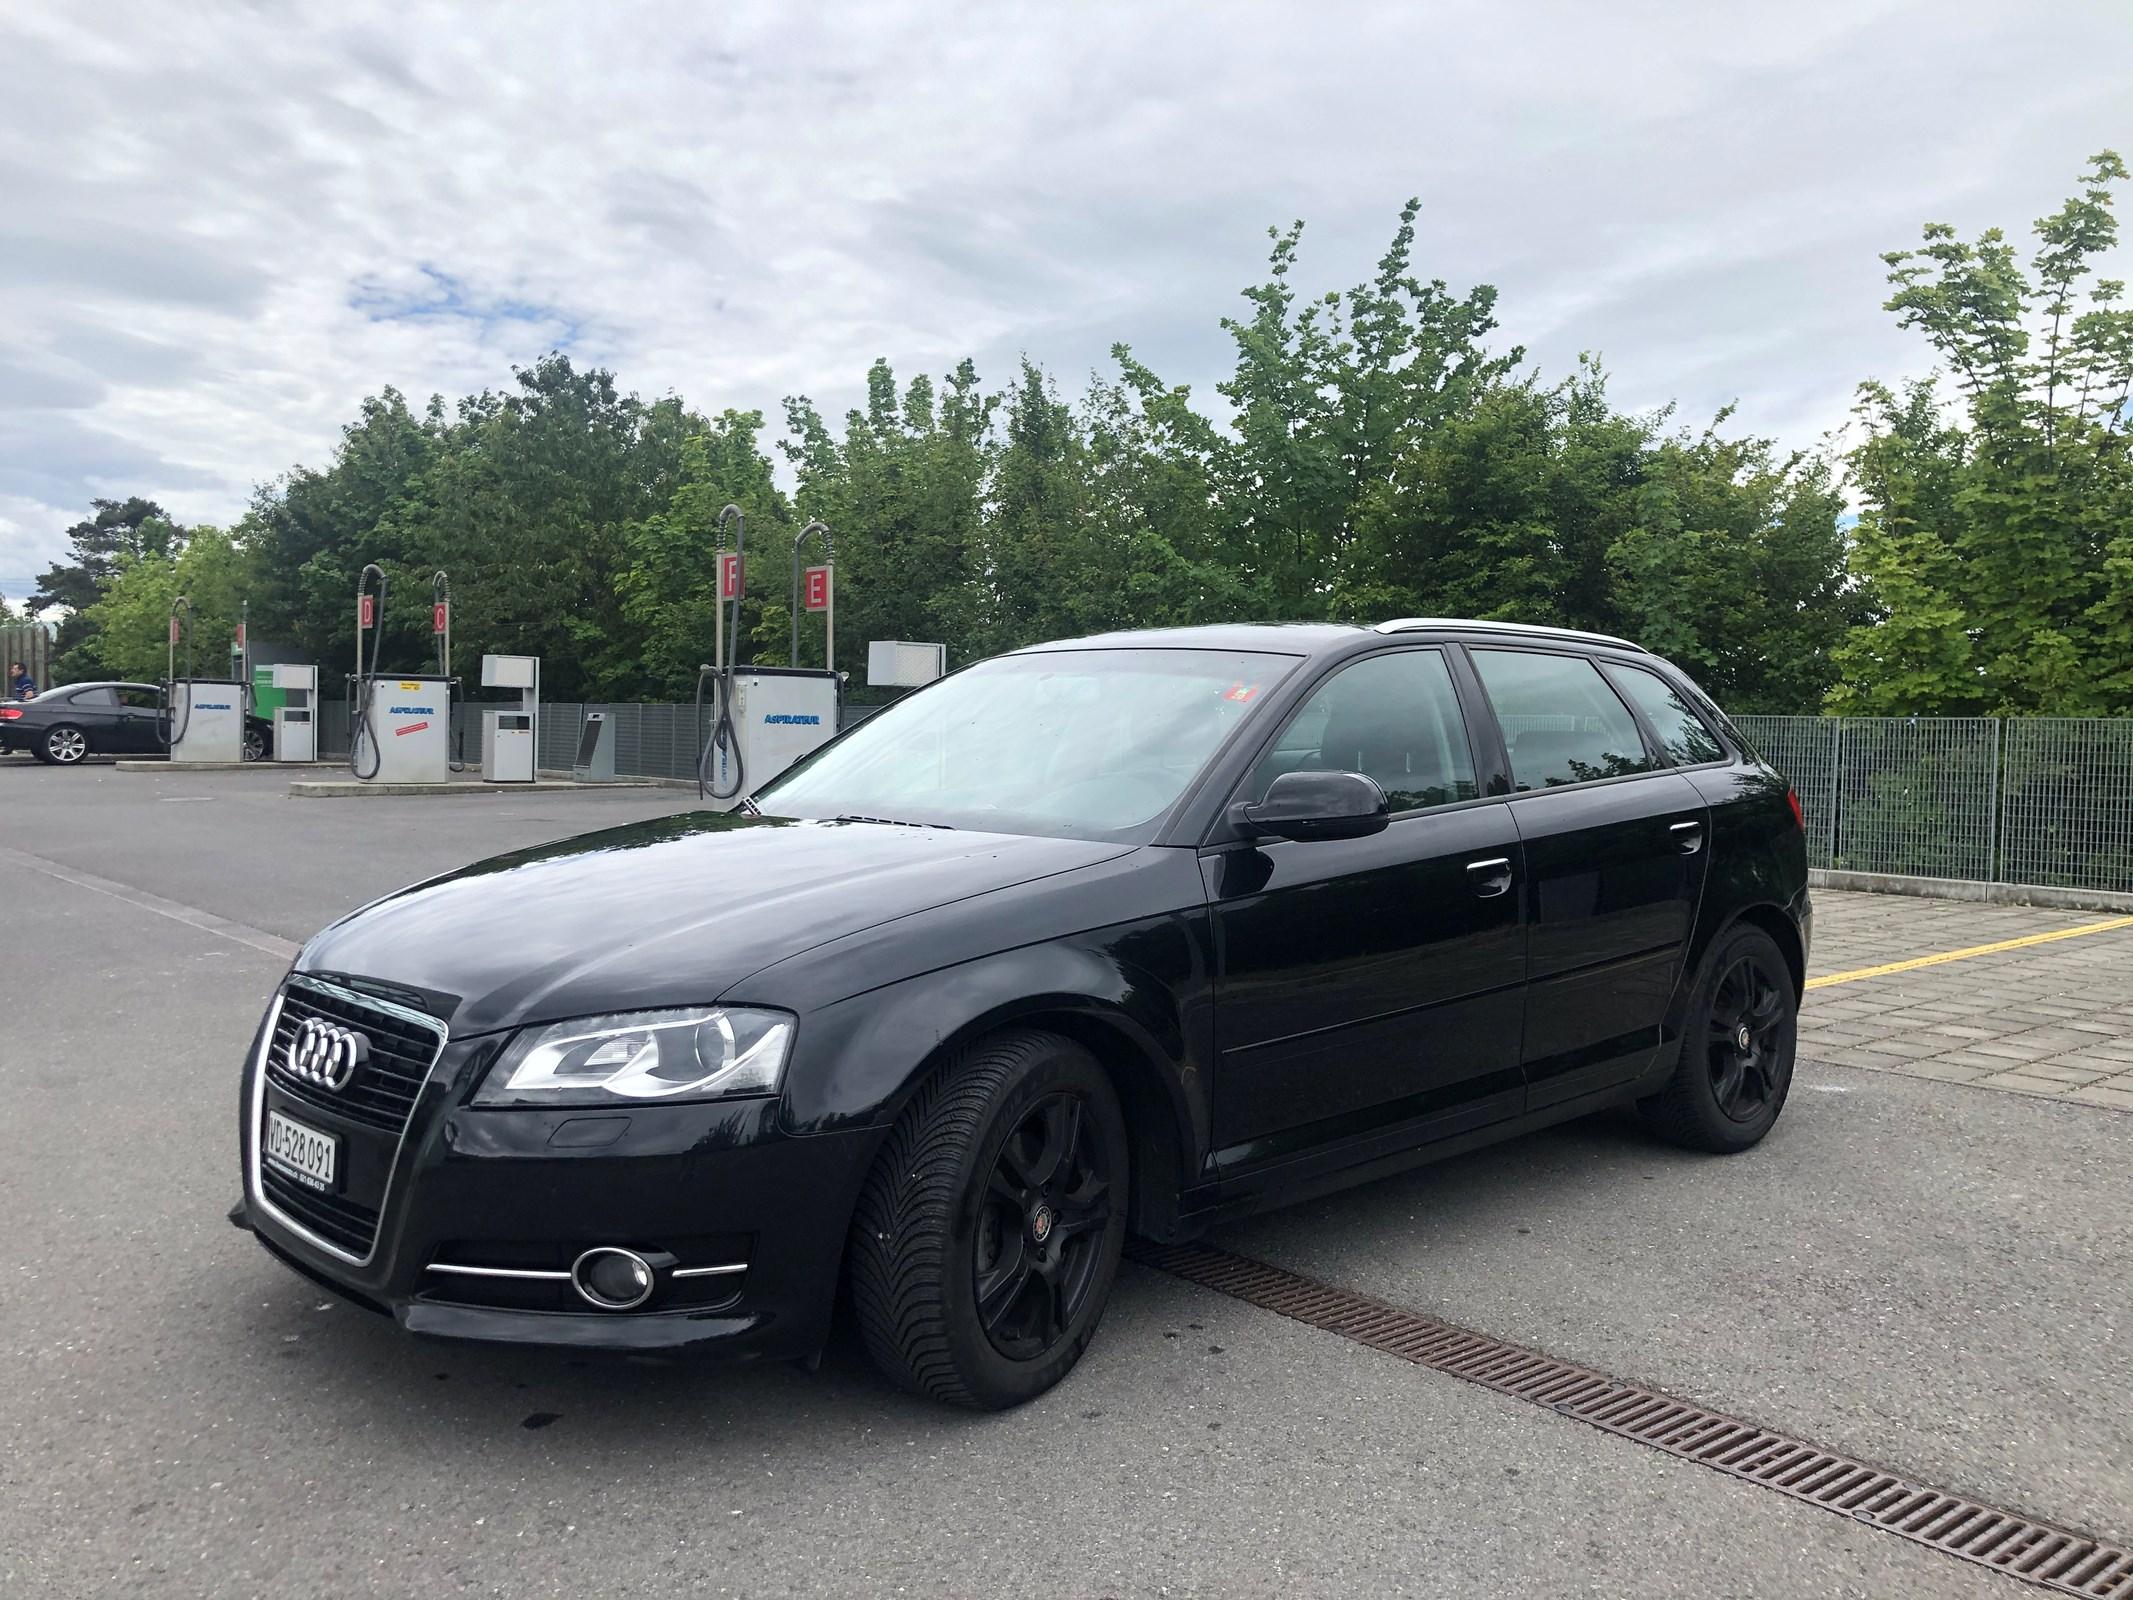 Audi A3 Sportback 2.0 TDI 140 Ambition